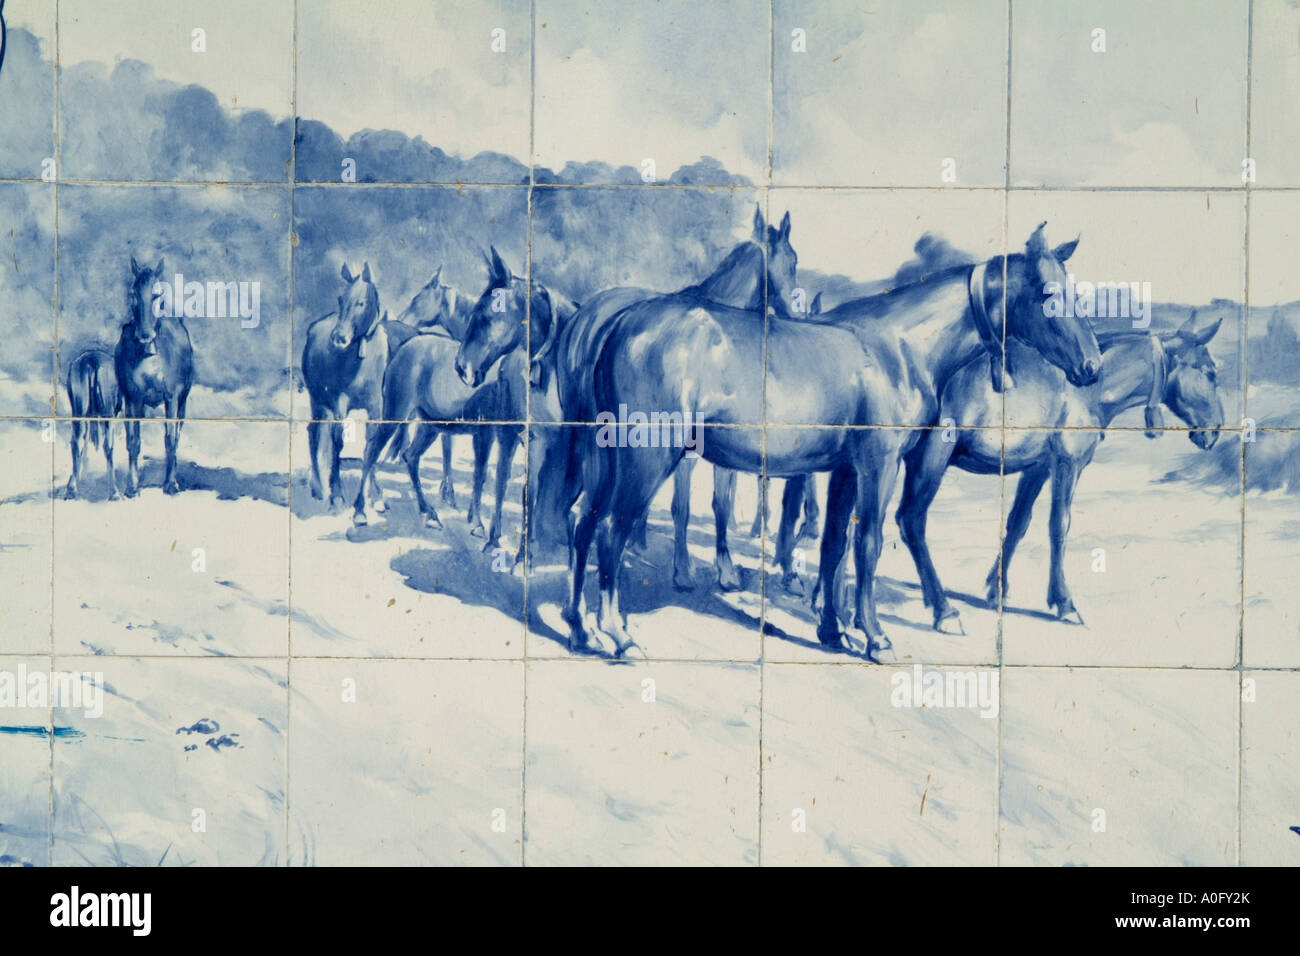 Tiled Mural in the Municipal Market of Santarem showing Lusitano horses - Stock Image